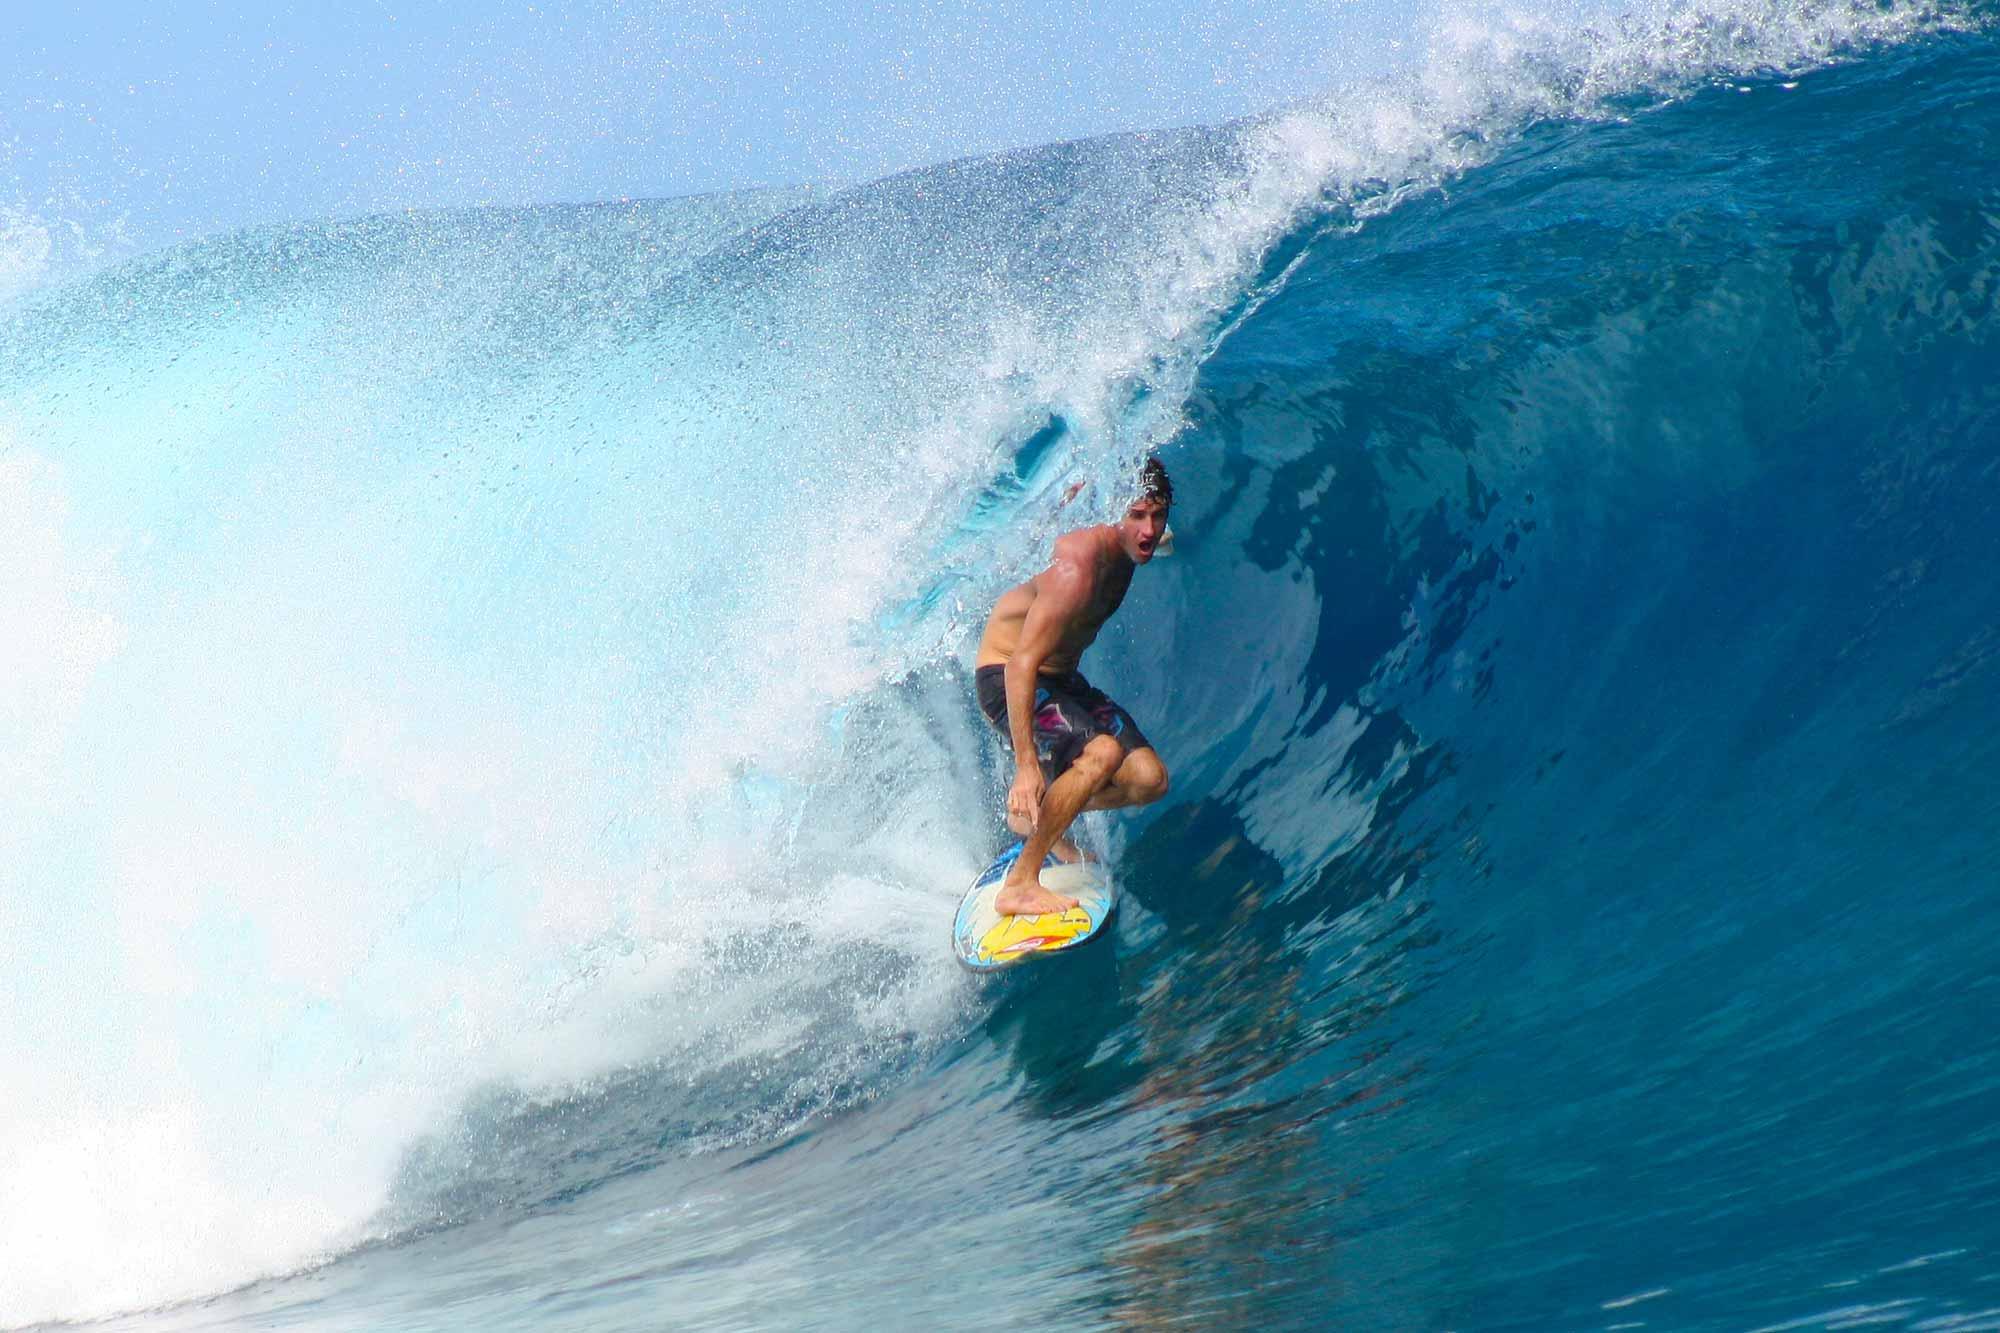 surfing-teahupoo-tahiti-frenchpolynesia